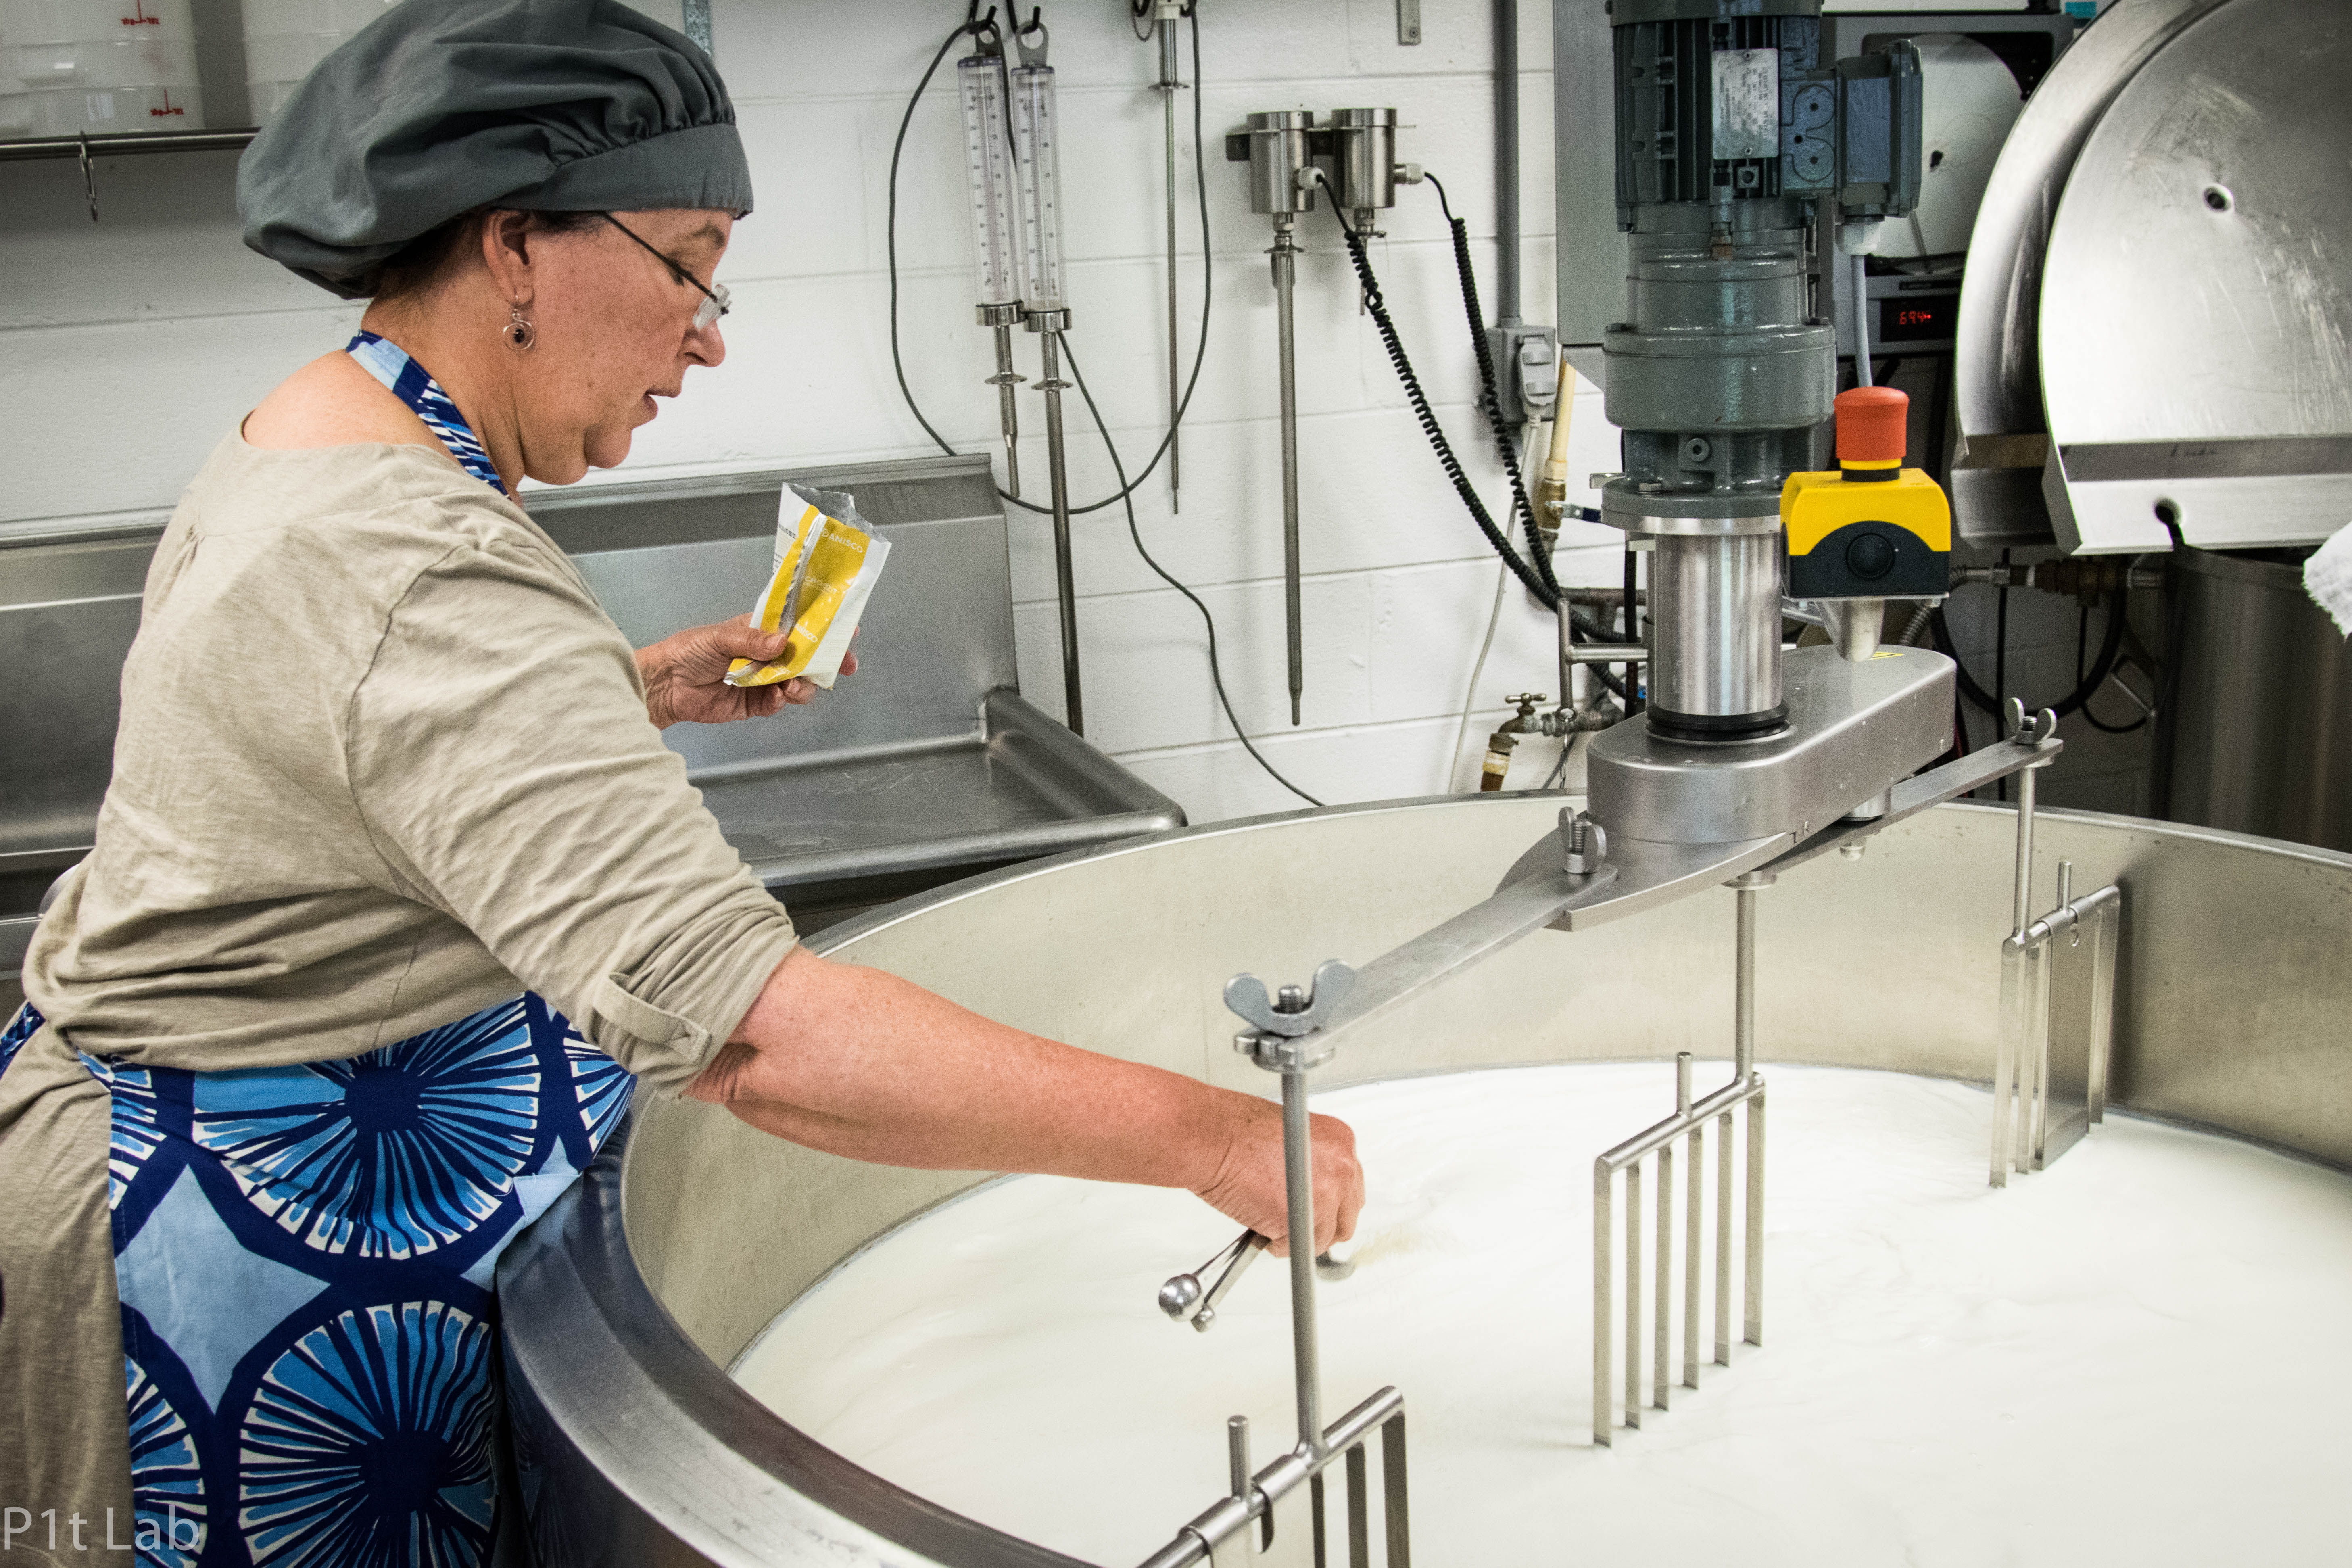 Stirring the milk